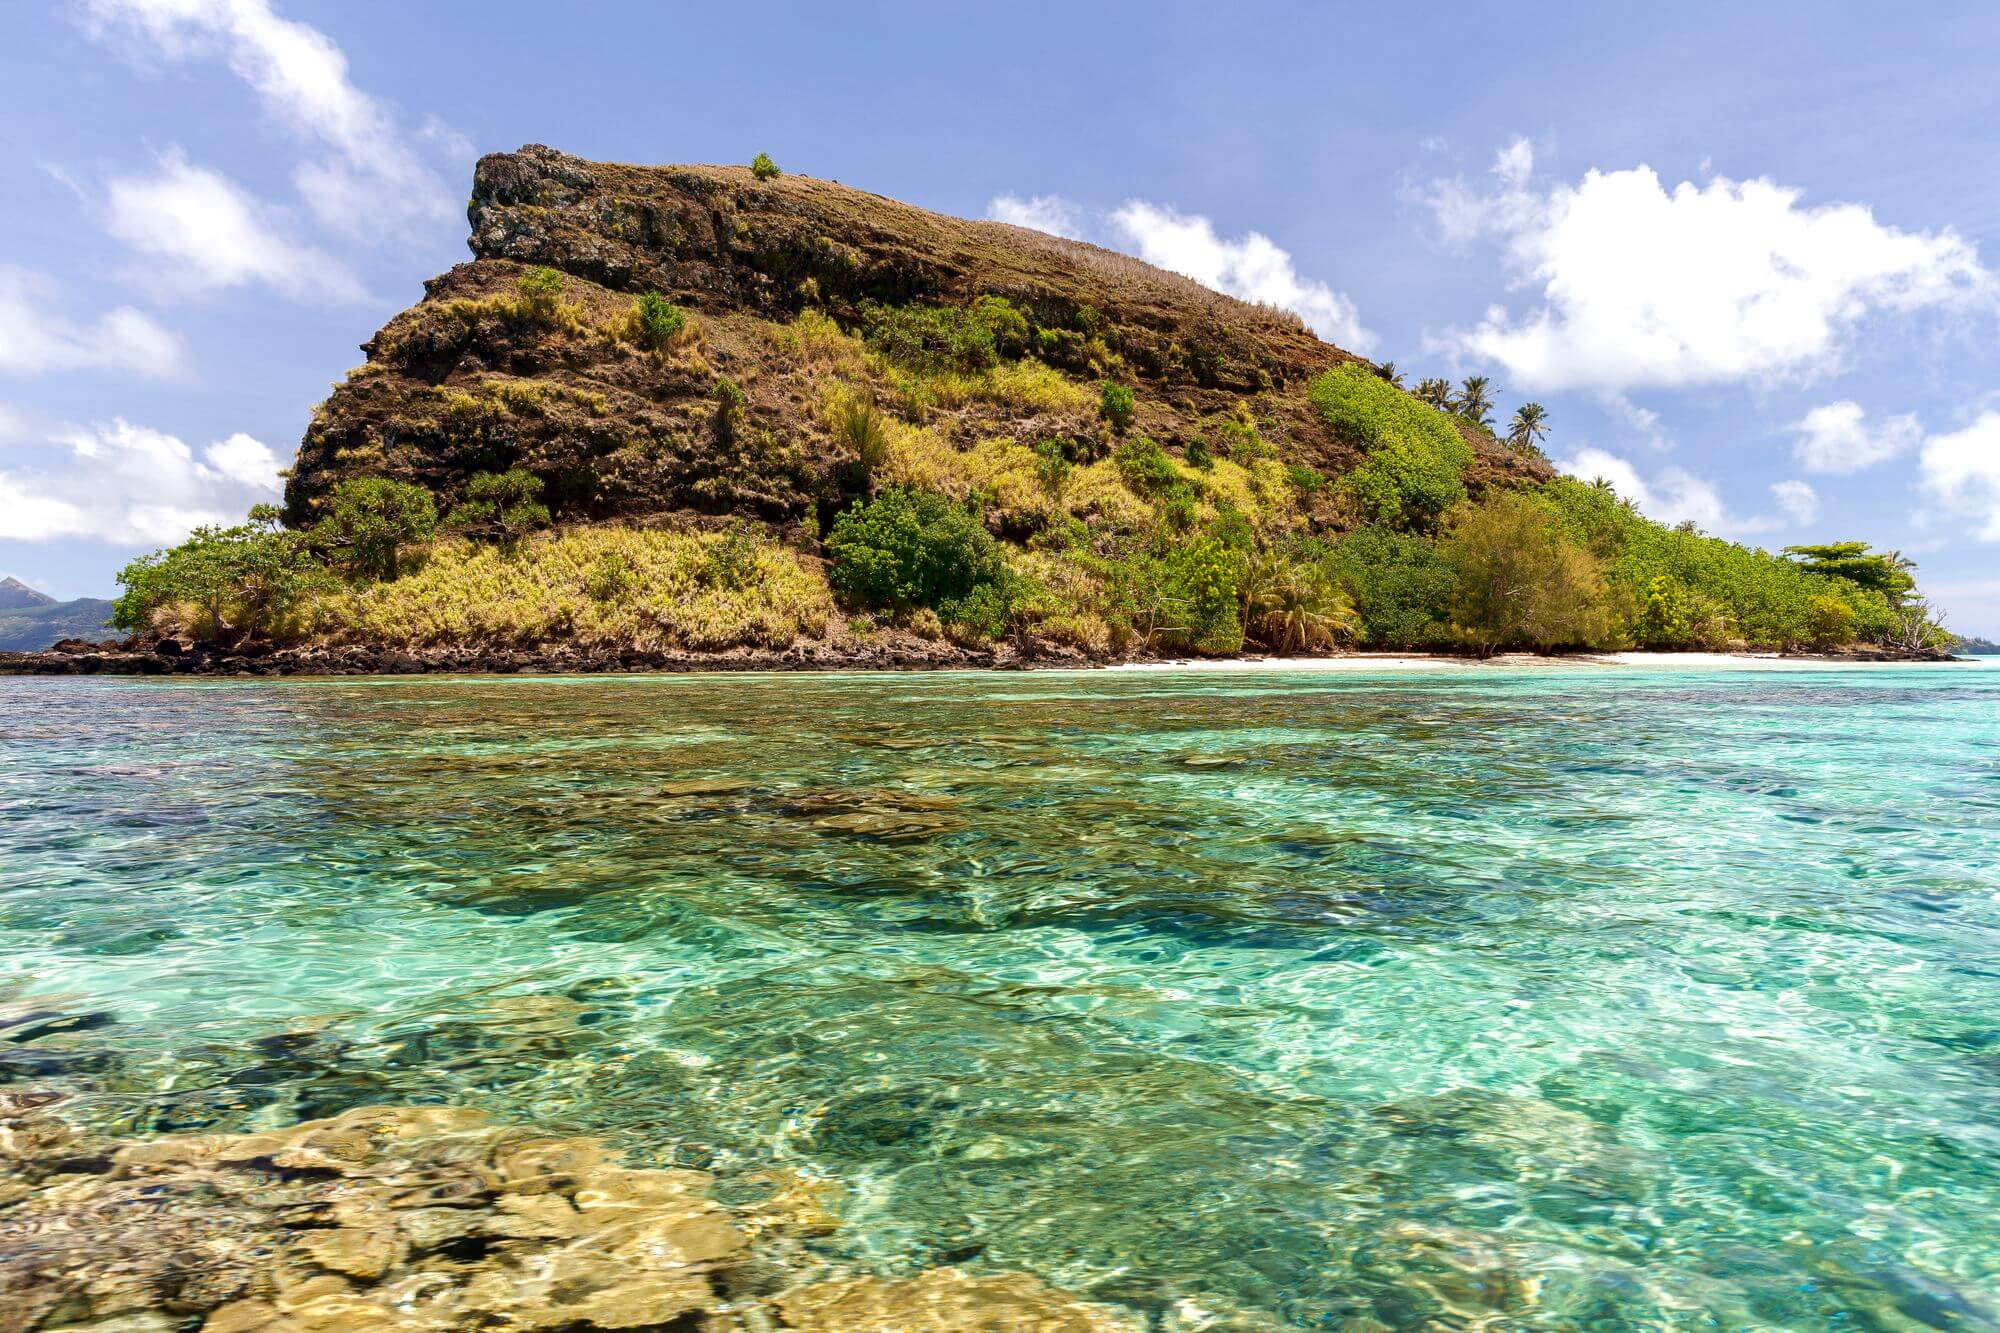 voyage aux iles gambier en Polynésie